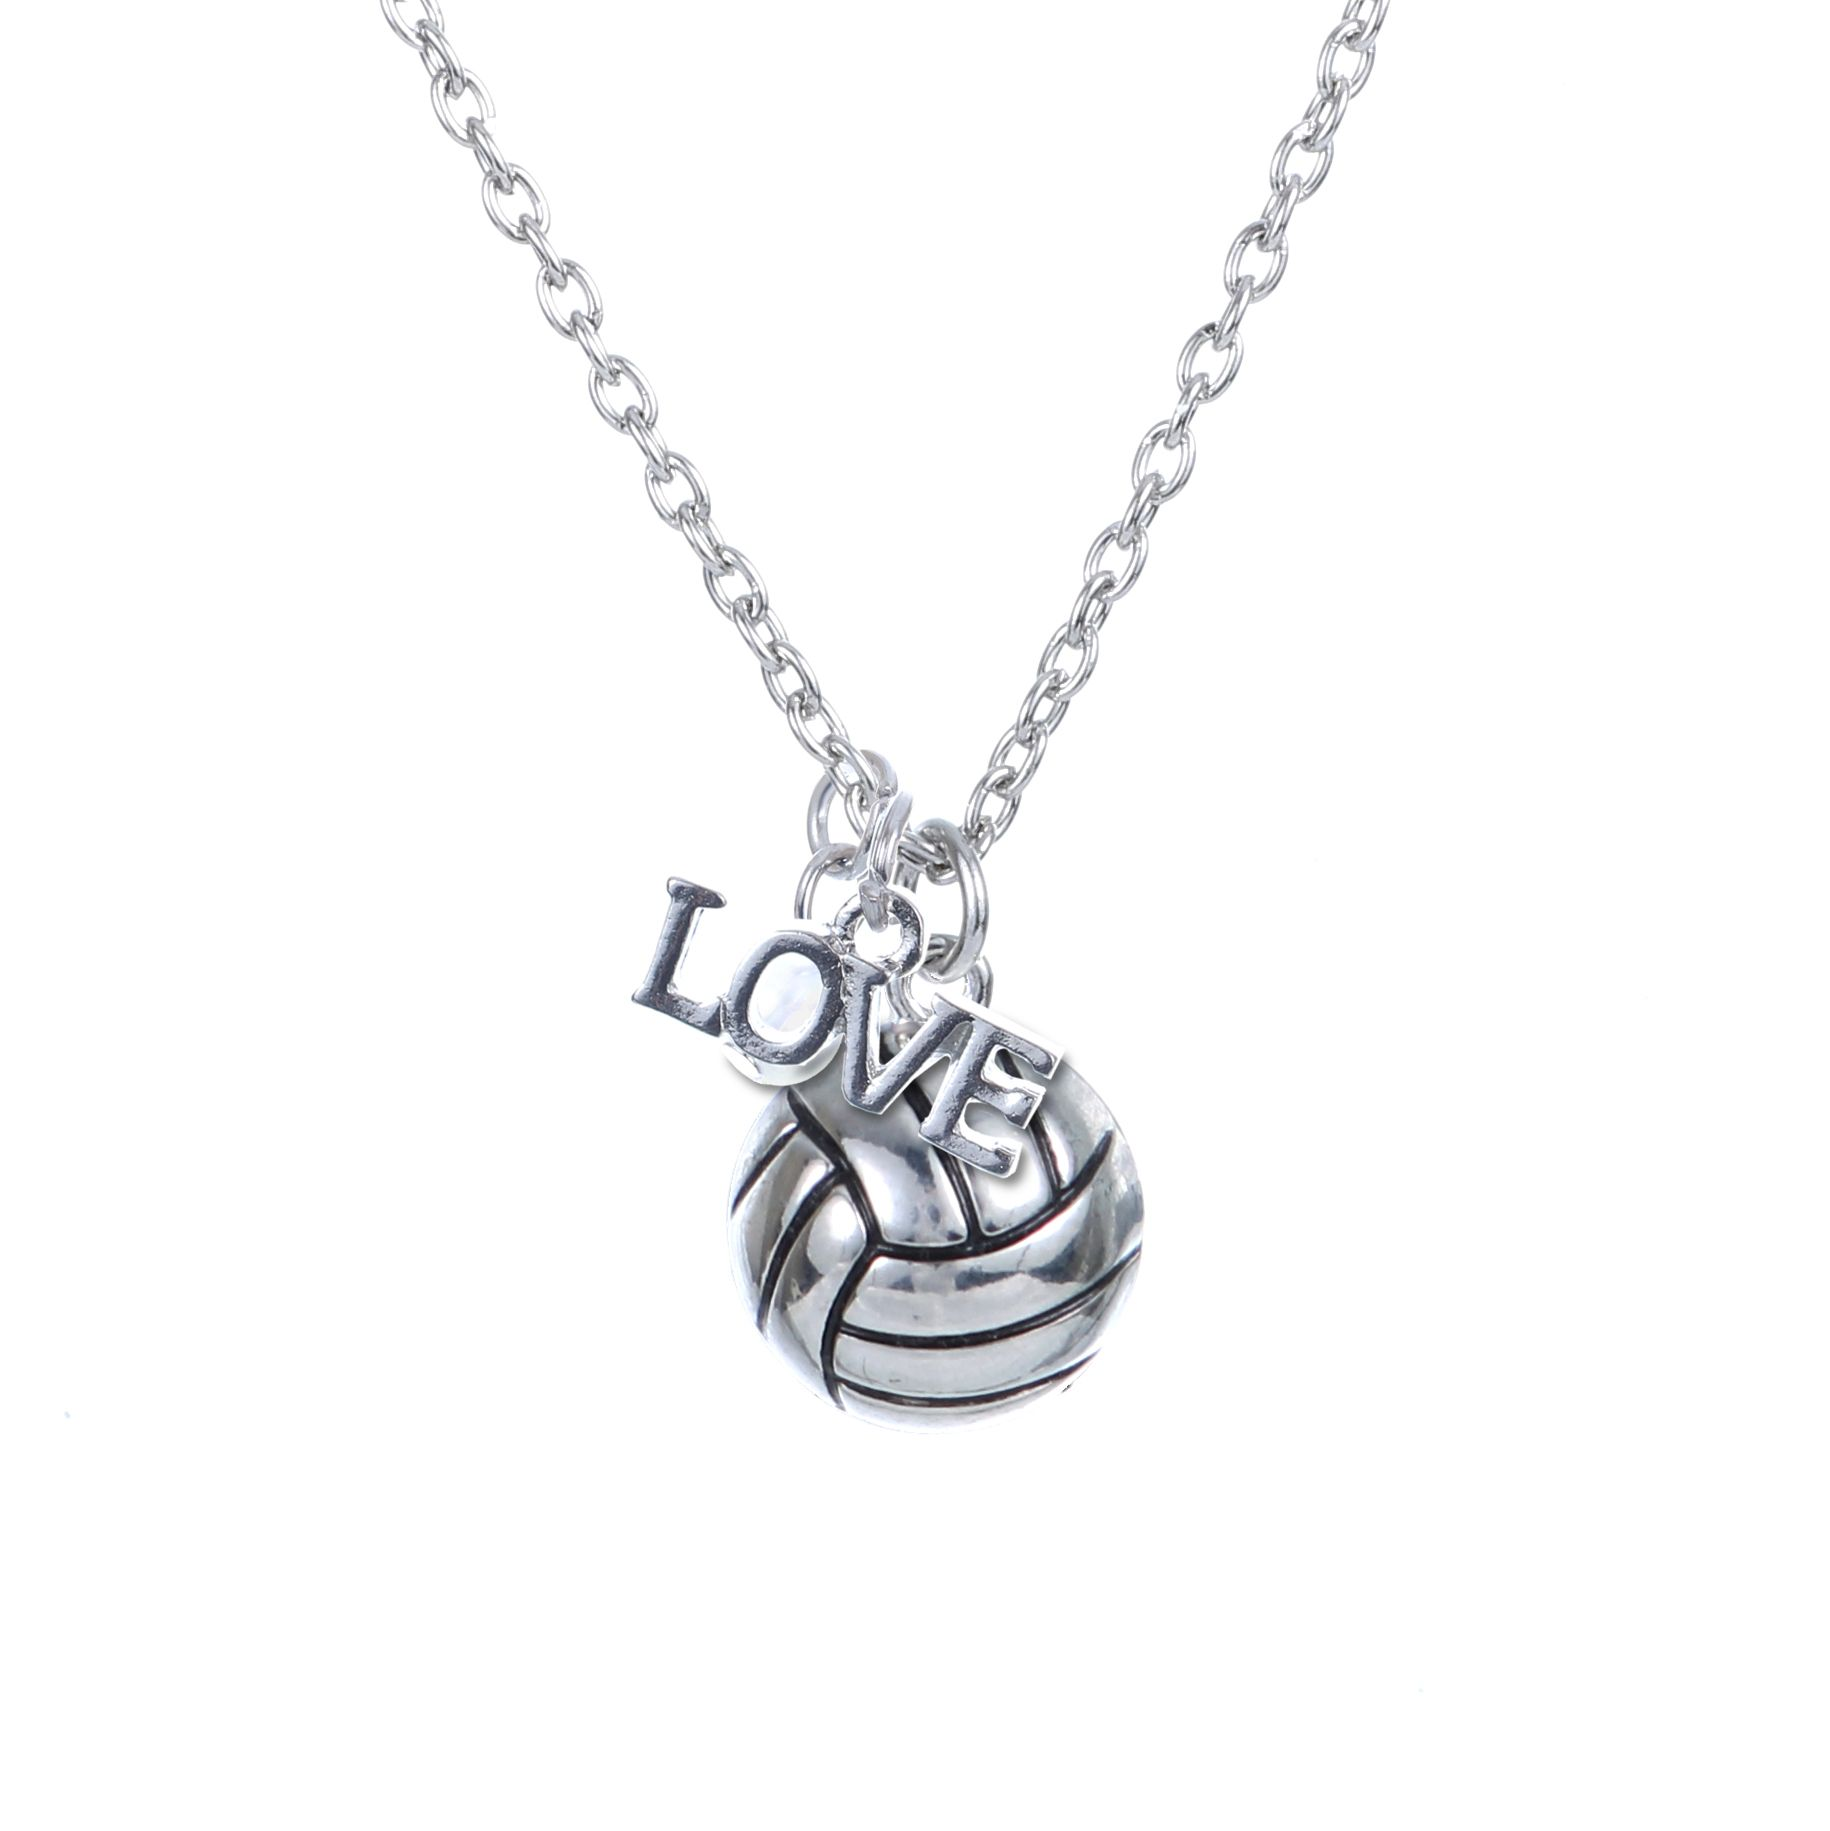 Customizable Volleyball Love Silver Necklace Volleyball Voley Voleibol Balones